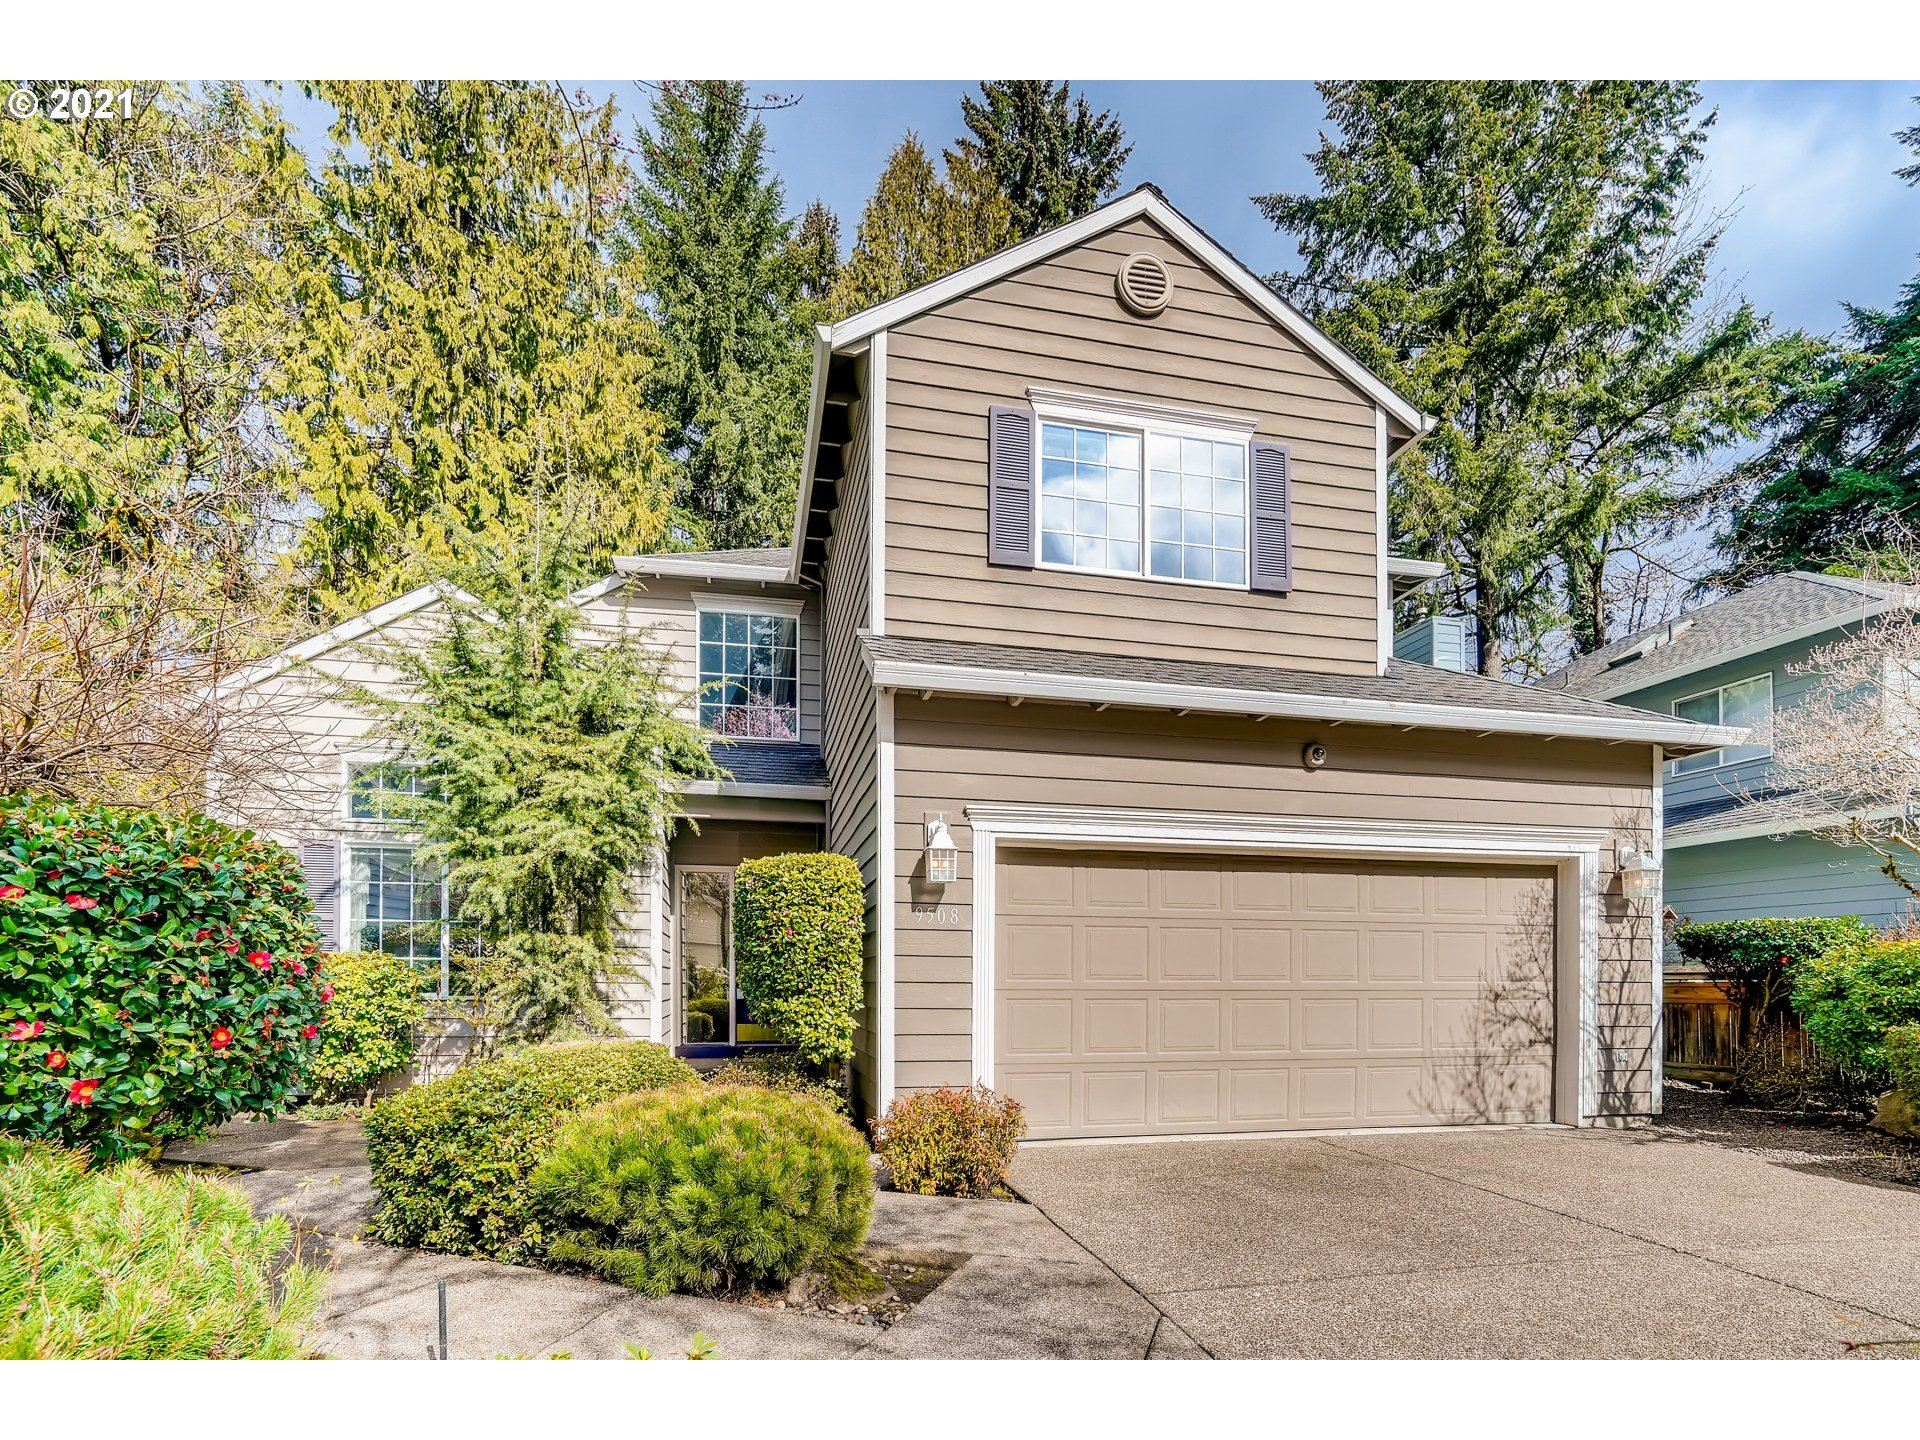 9508 SW JONATHAN CT, Portland, OR 97219 - MLS#: 21390716